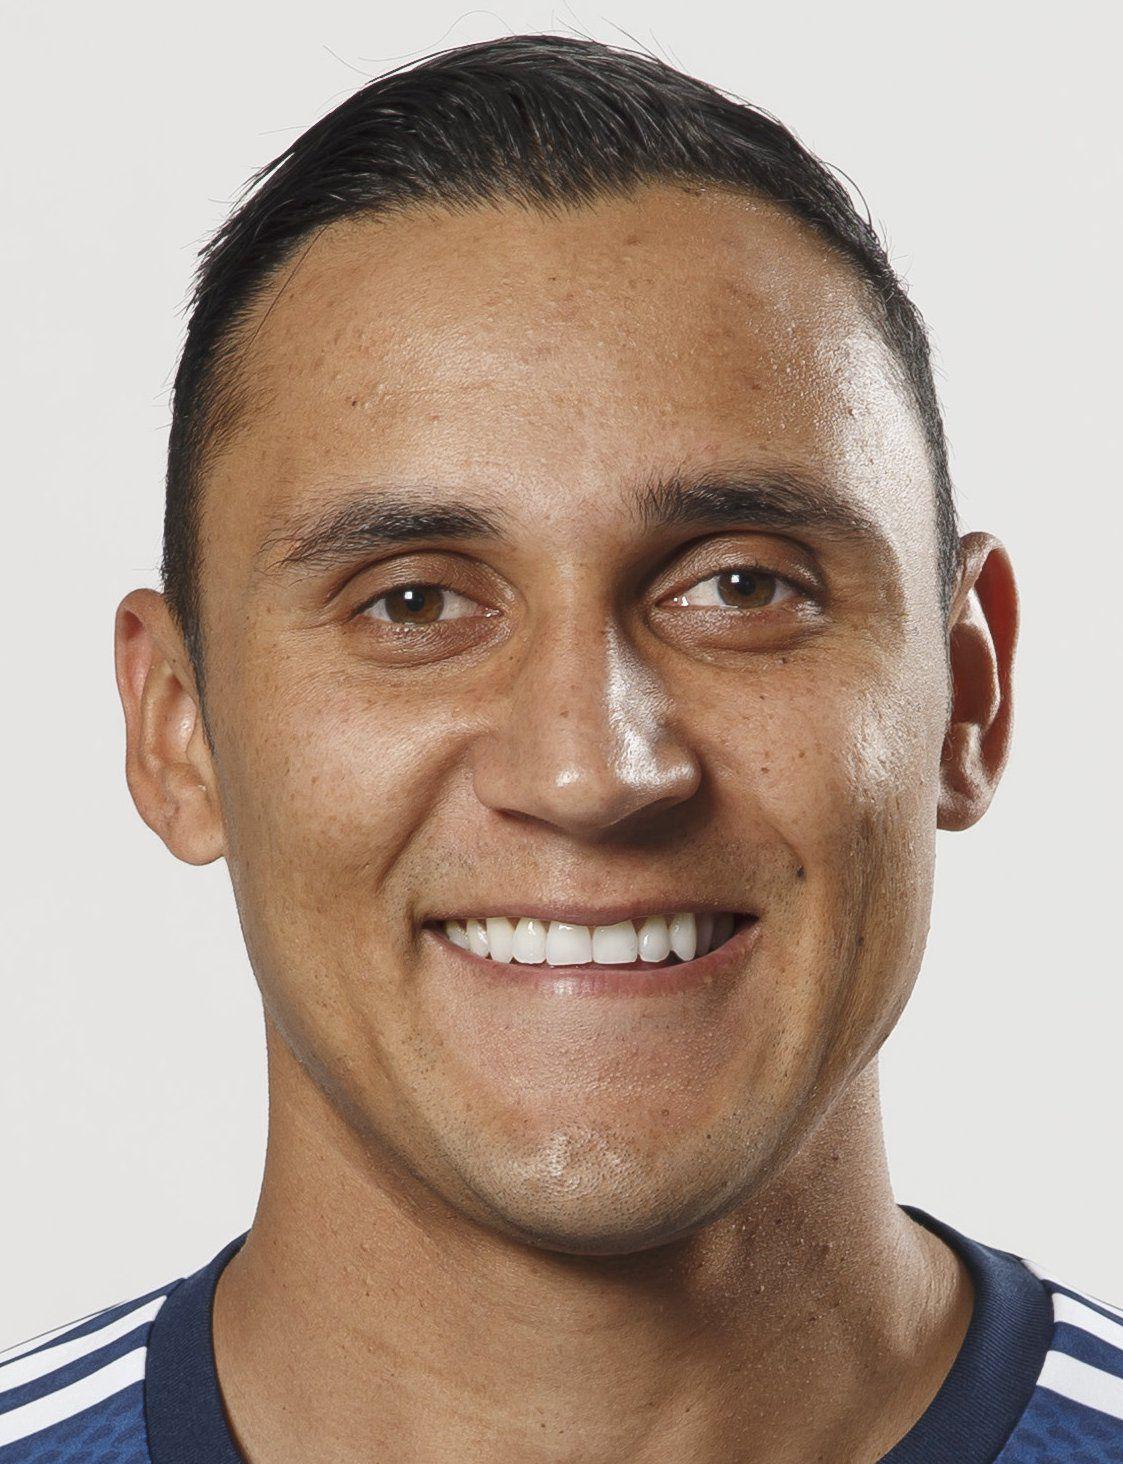 Keilor Navas, football player